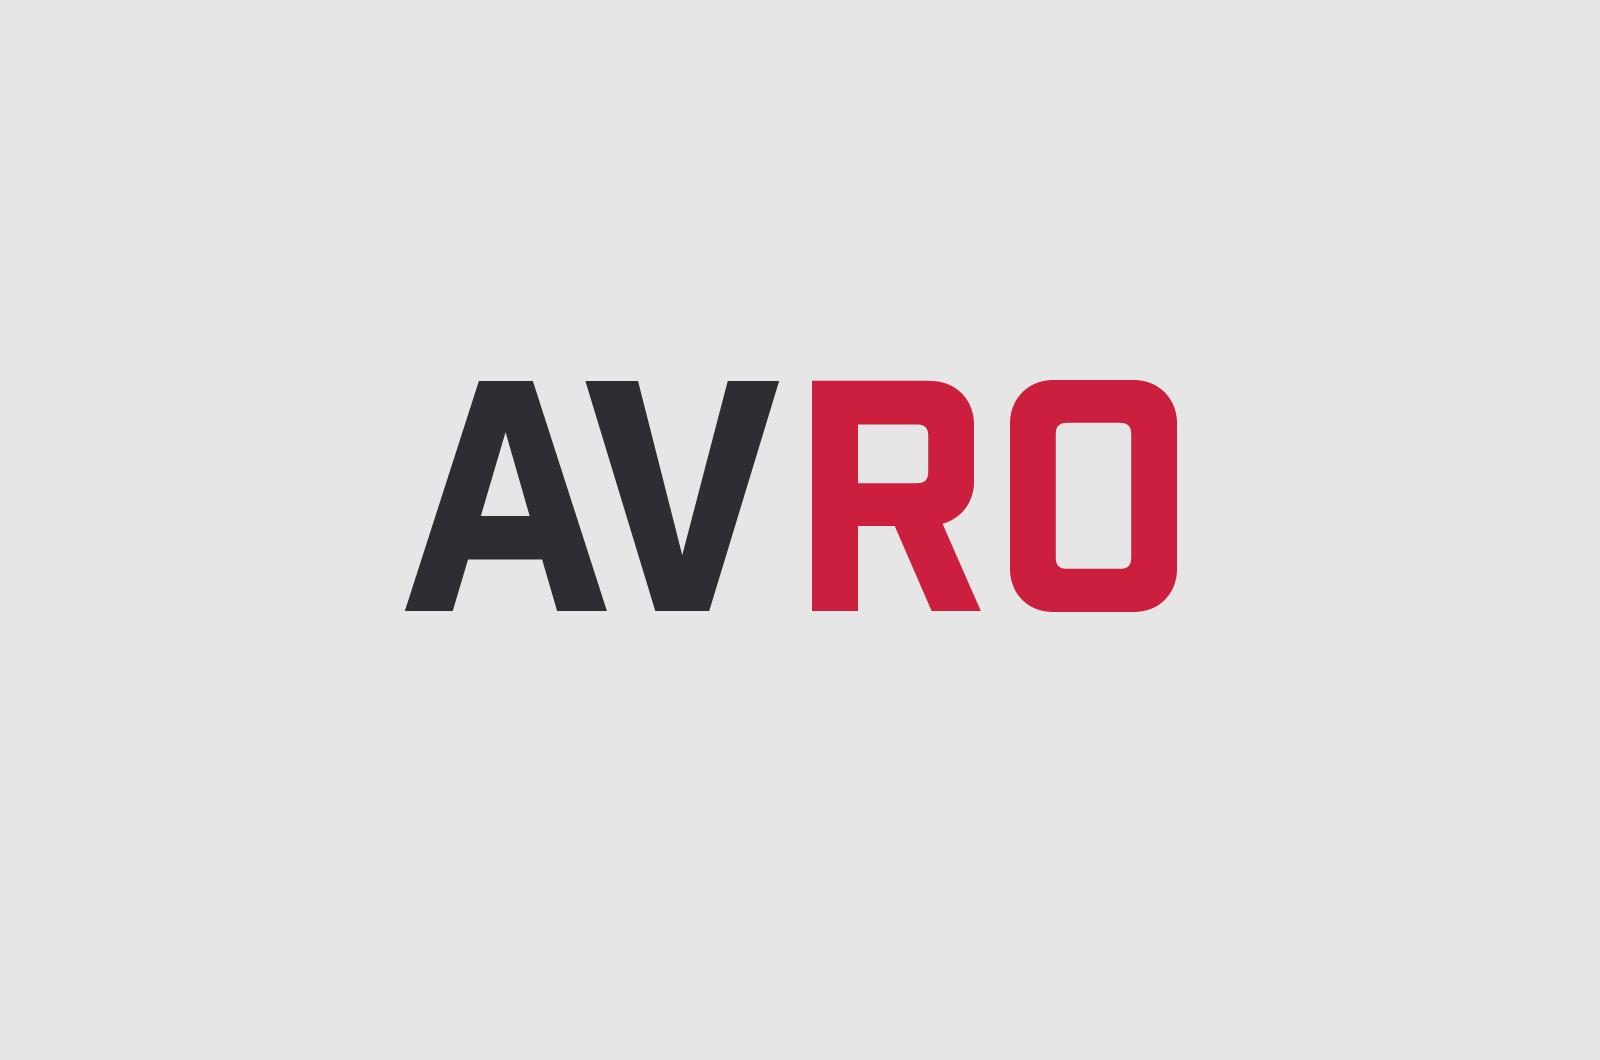 AVRO Brand Logotype 01